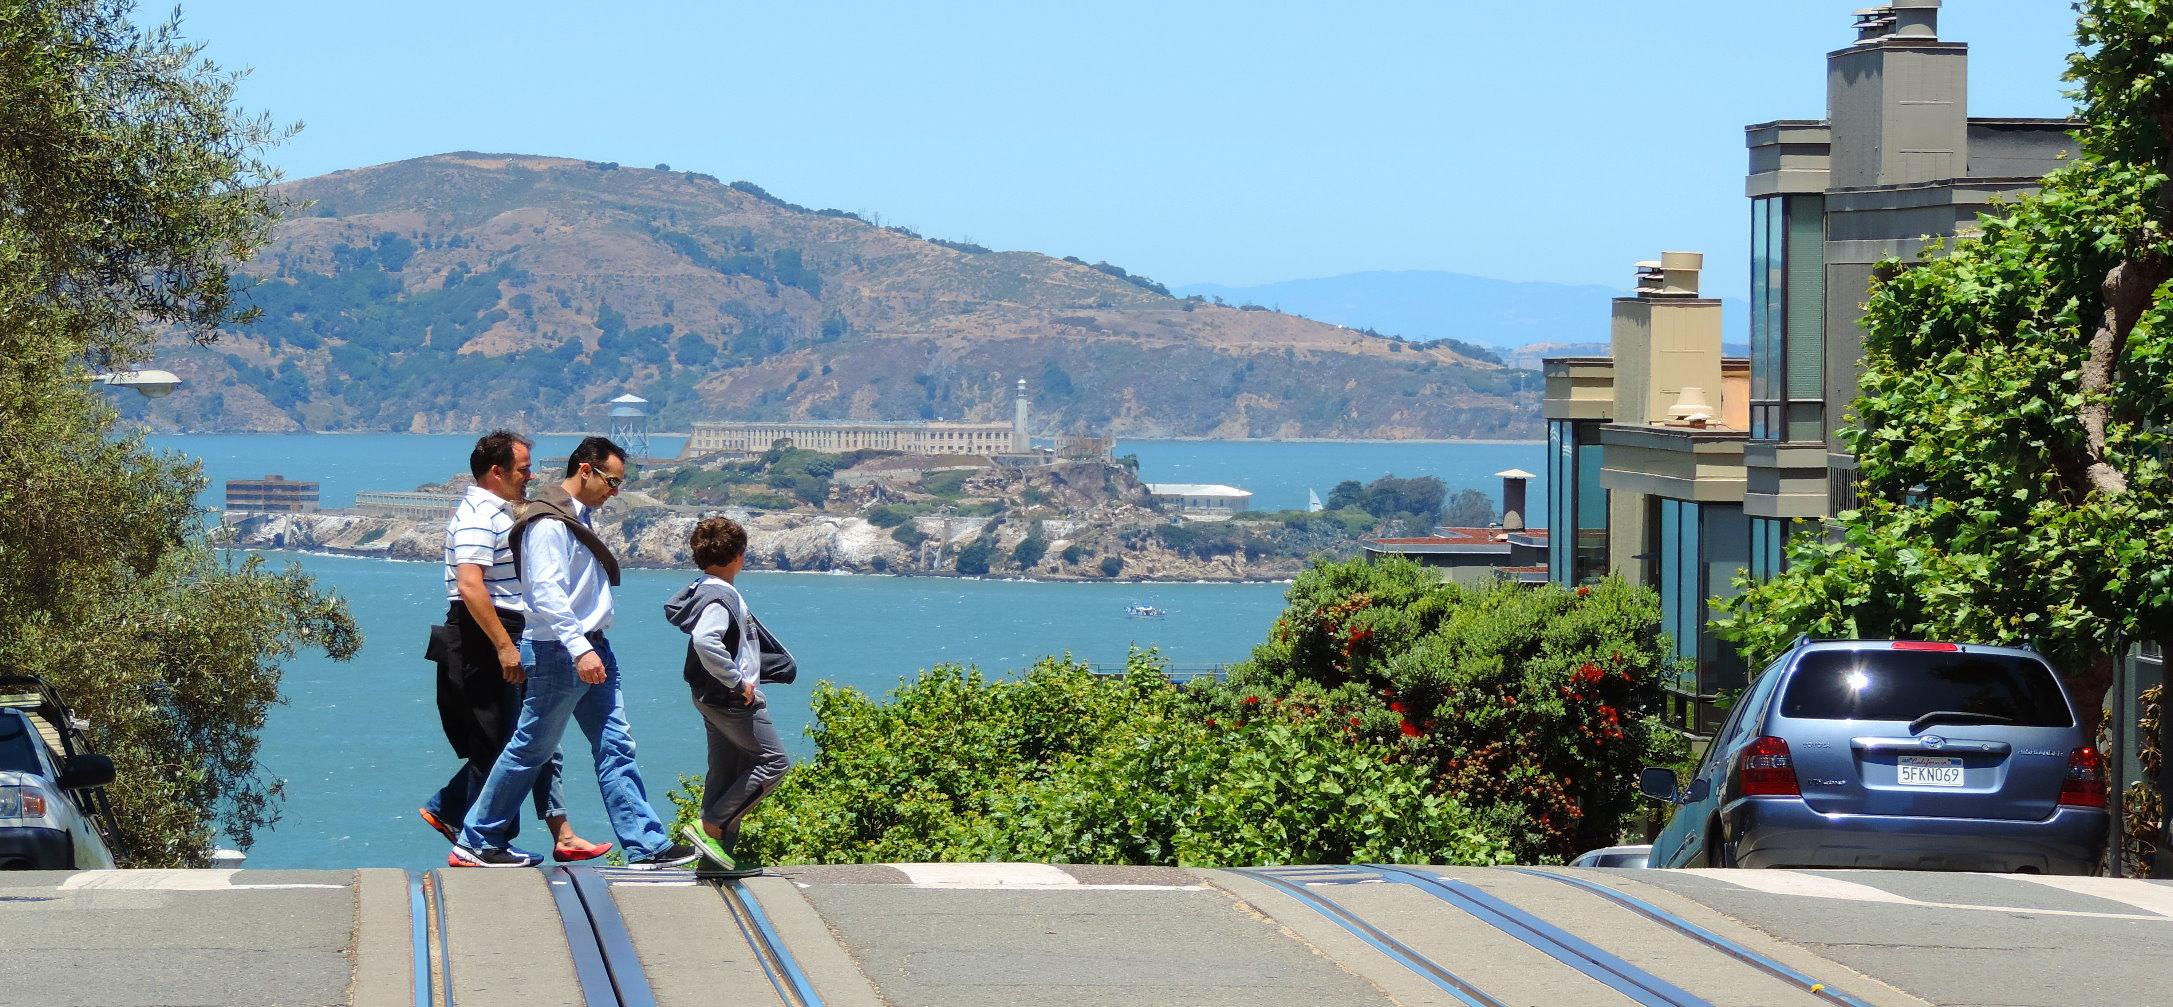 walking-tours-visit-alcatraz-island